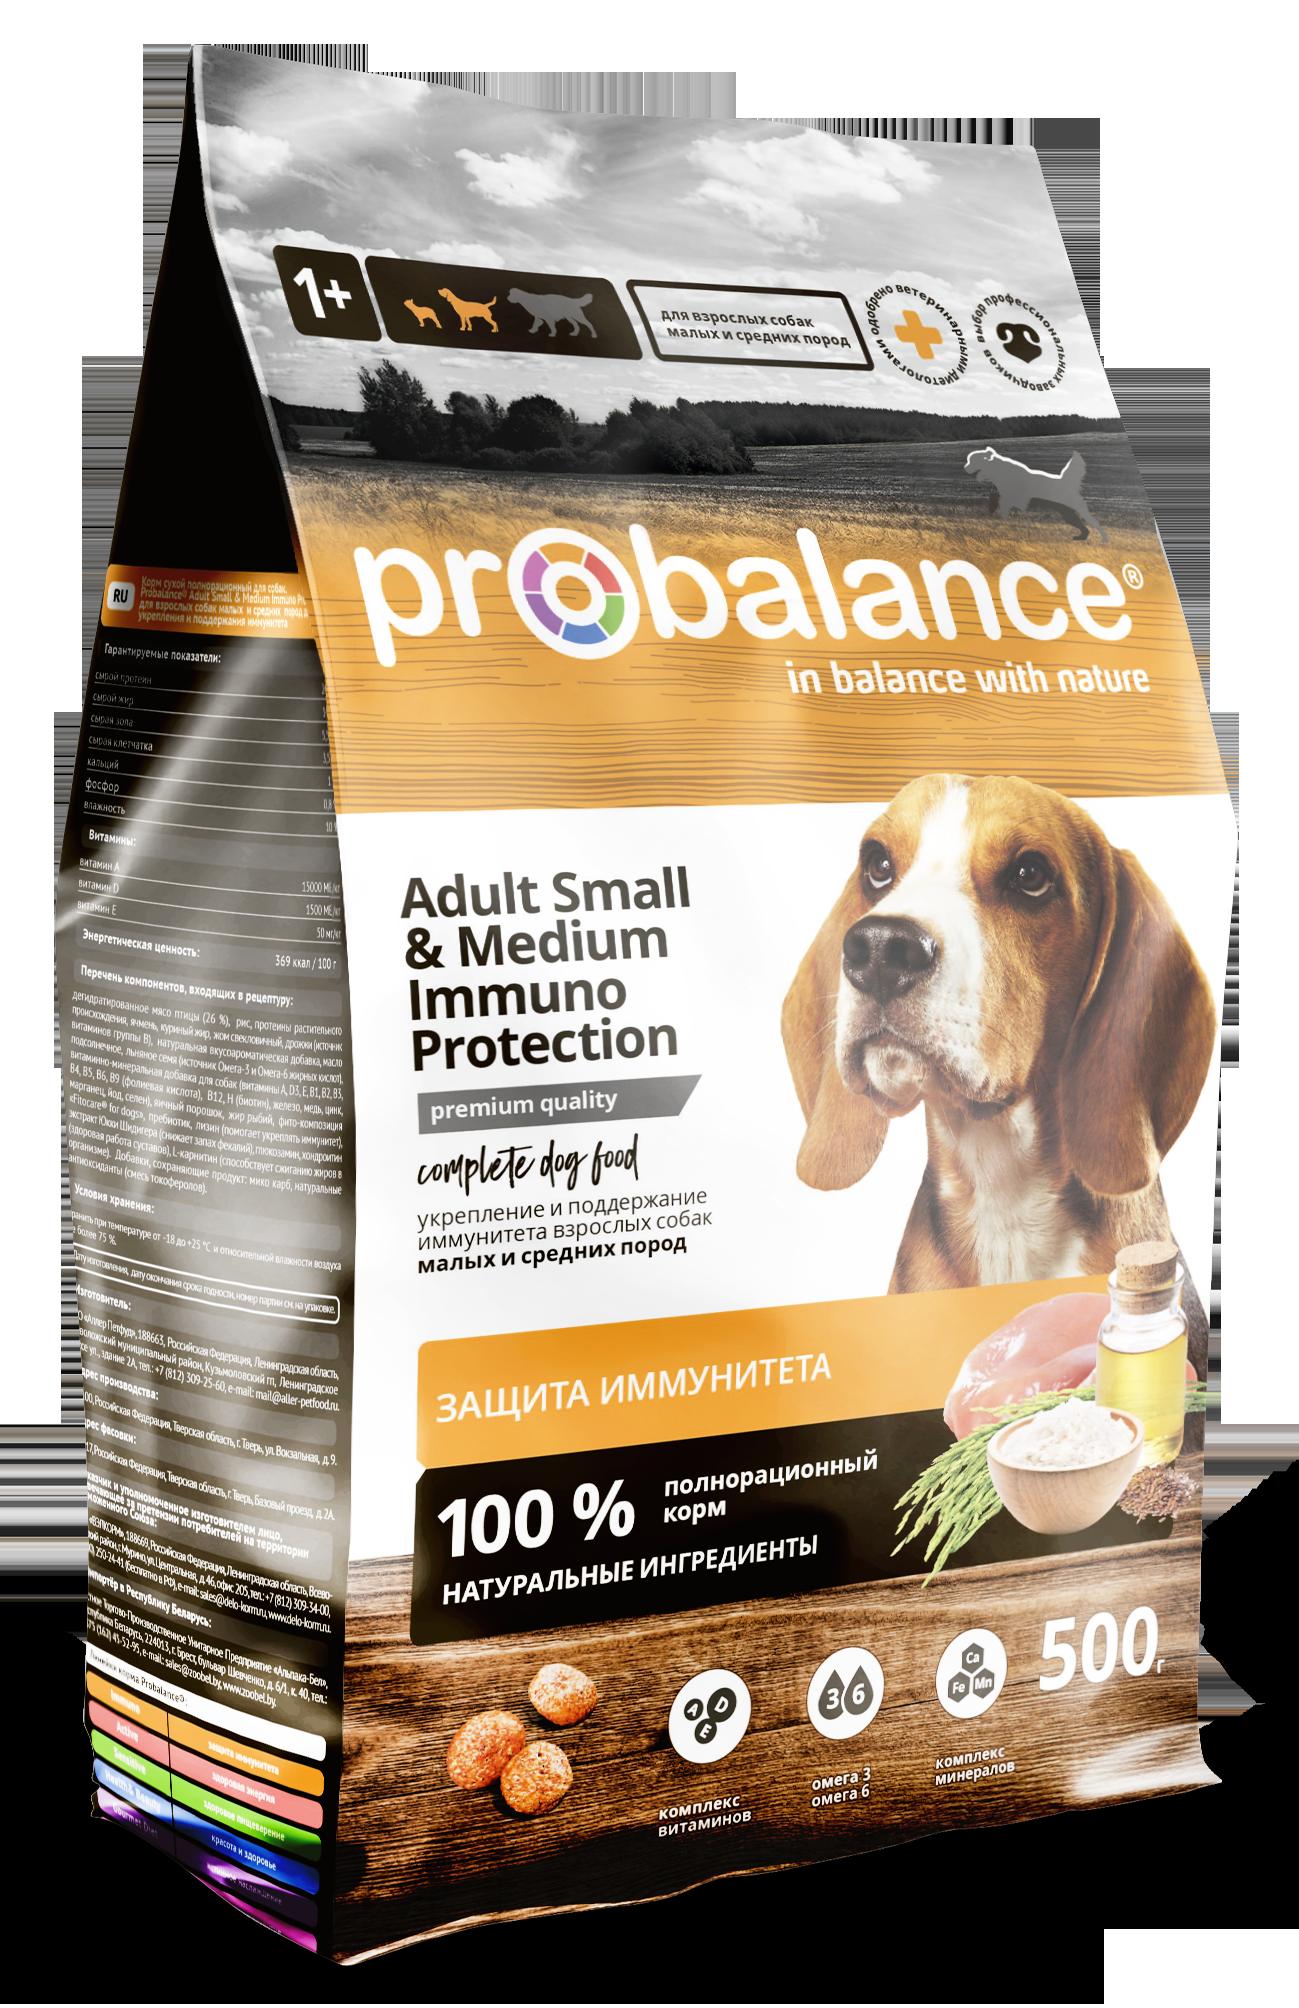 Сухой корм Корм ProBalance Immuno Adult Small and Medium для взрослых собак малых и средних пород 500_PB_dog_IP_Small_Medium.png